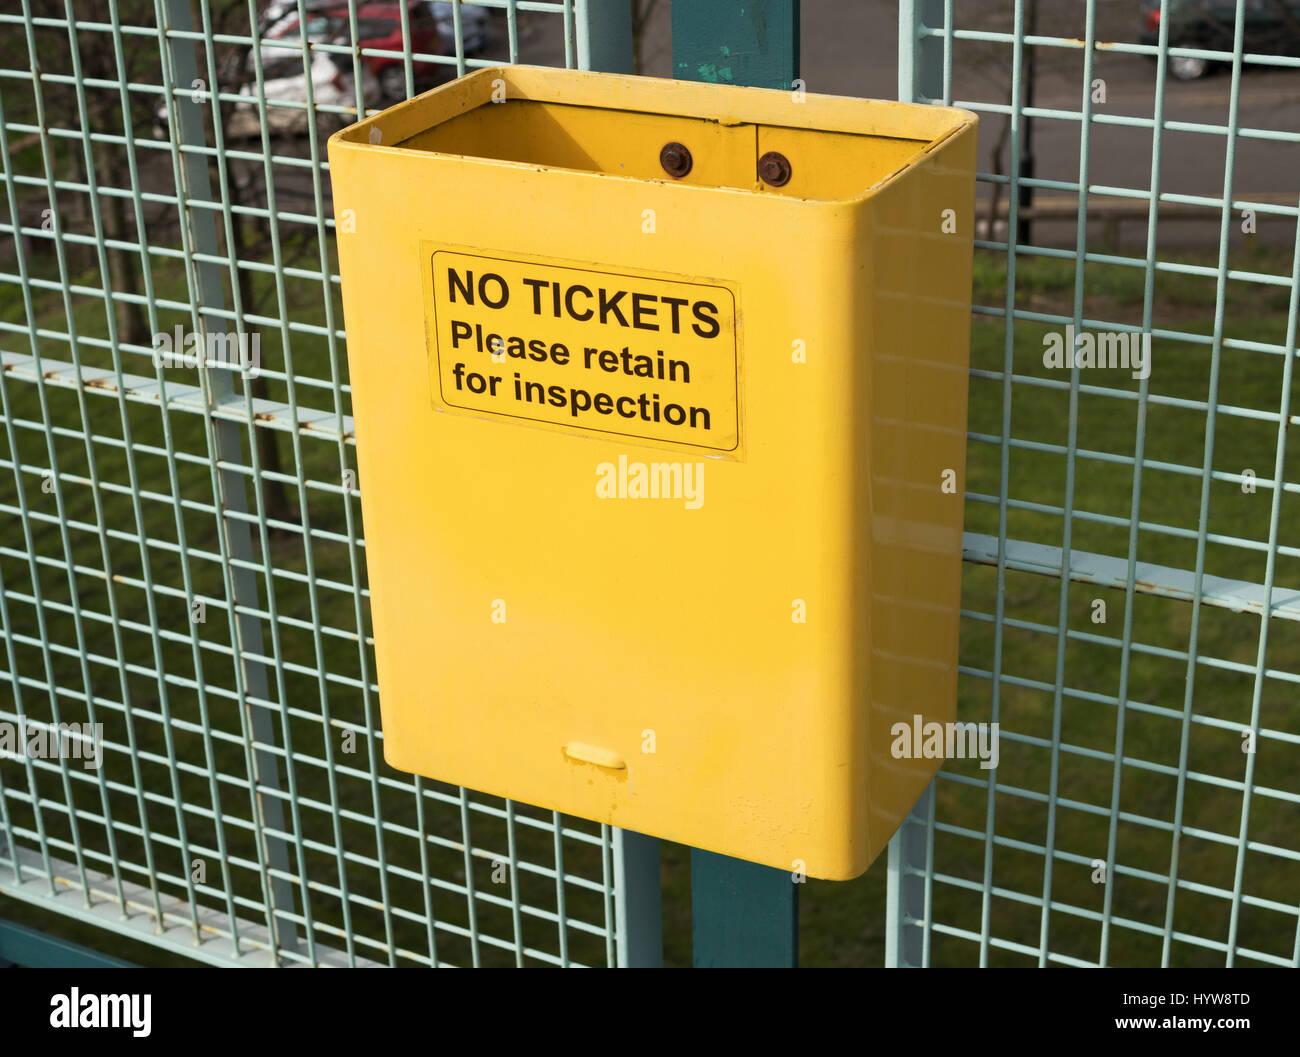 Bin marked No Tickets please retain for inspection, Tyneside Metro, England, UK - Stock Image